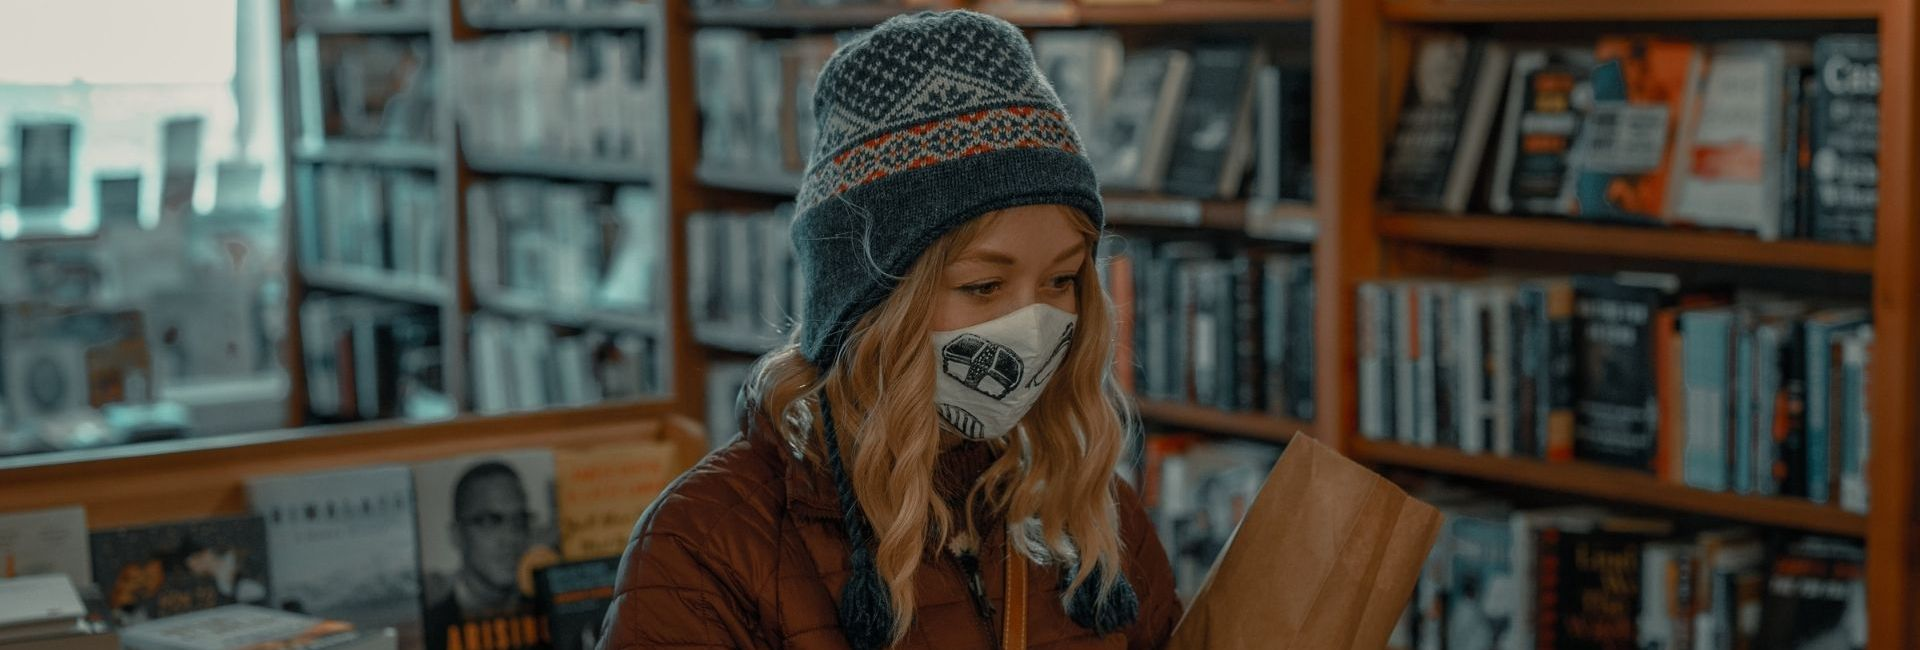 etudiante masquee dans une librairie